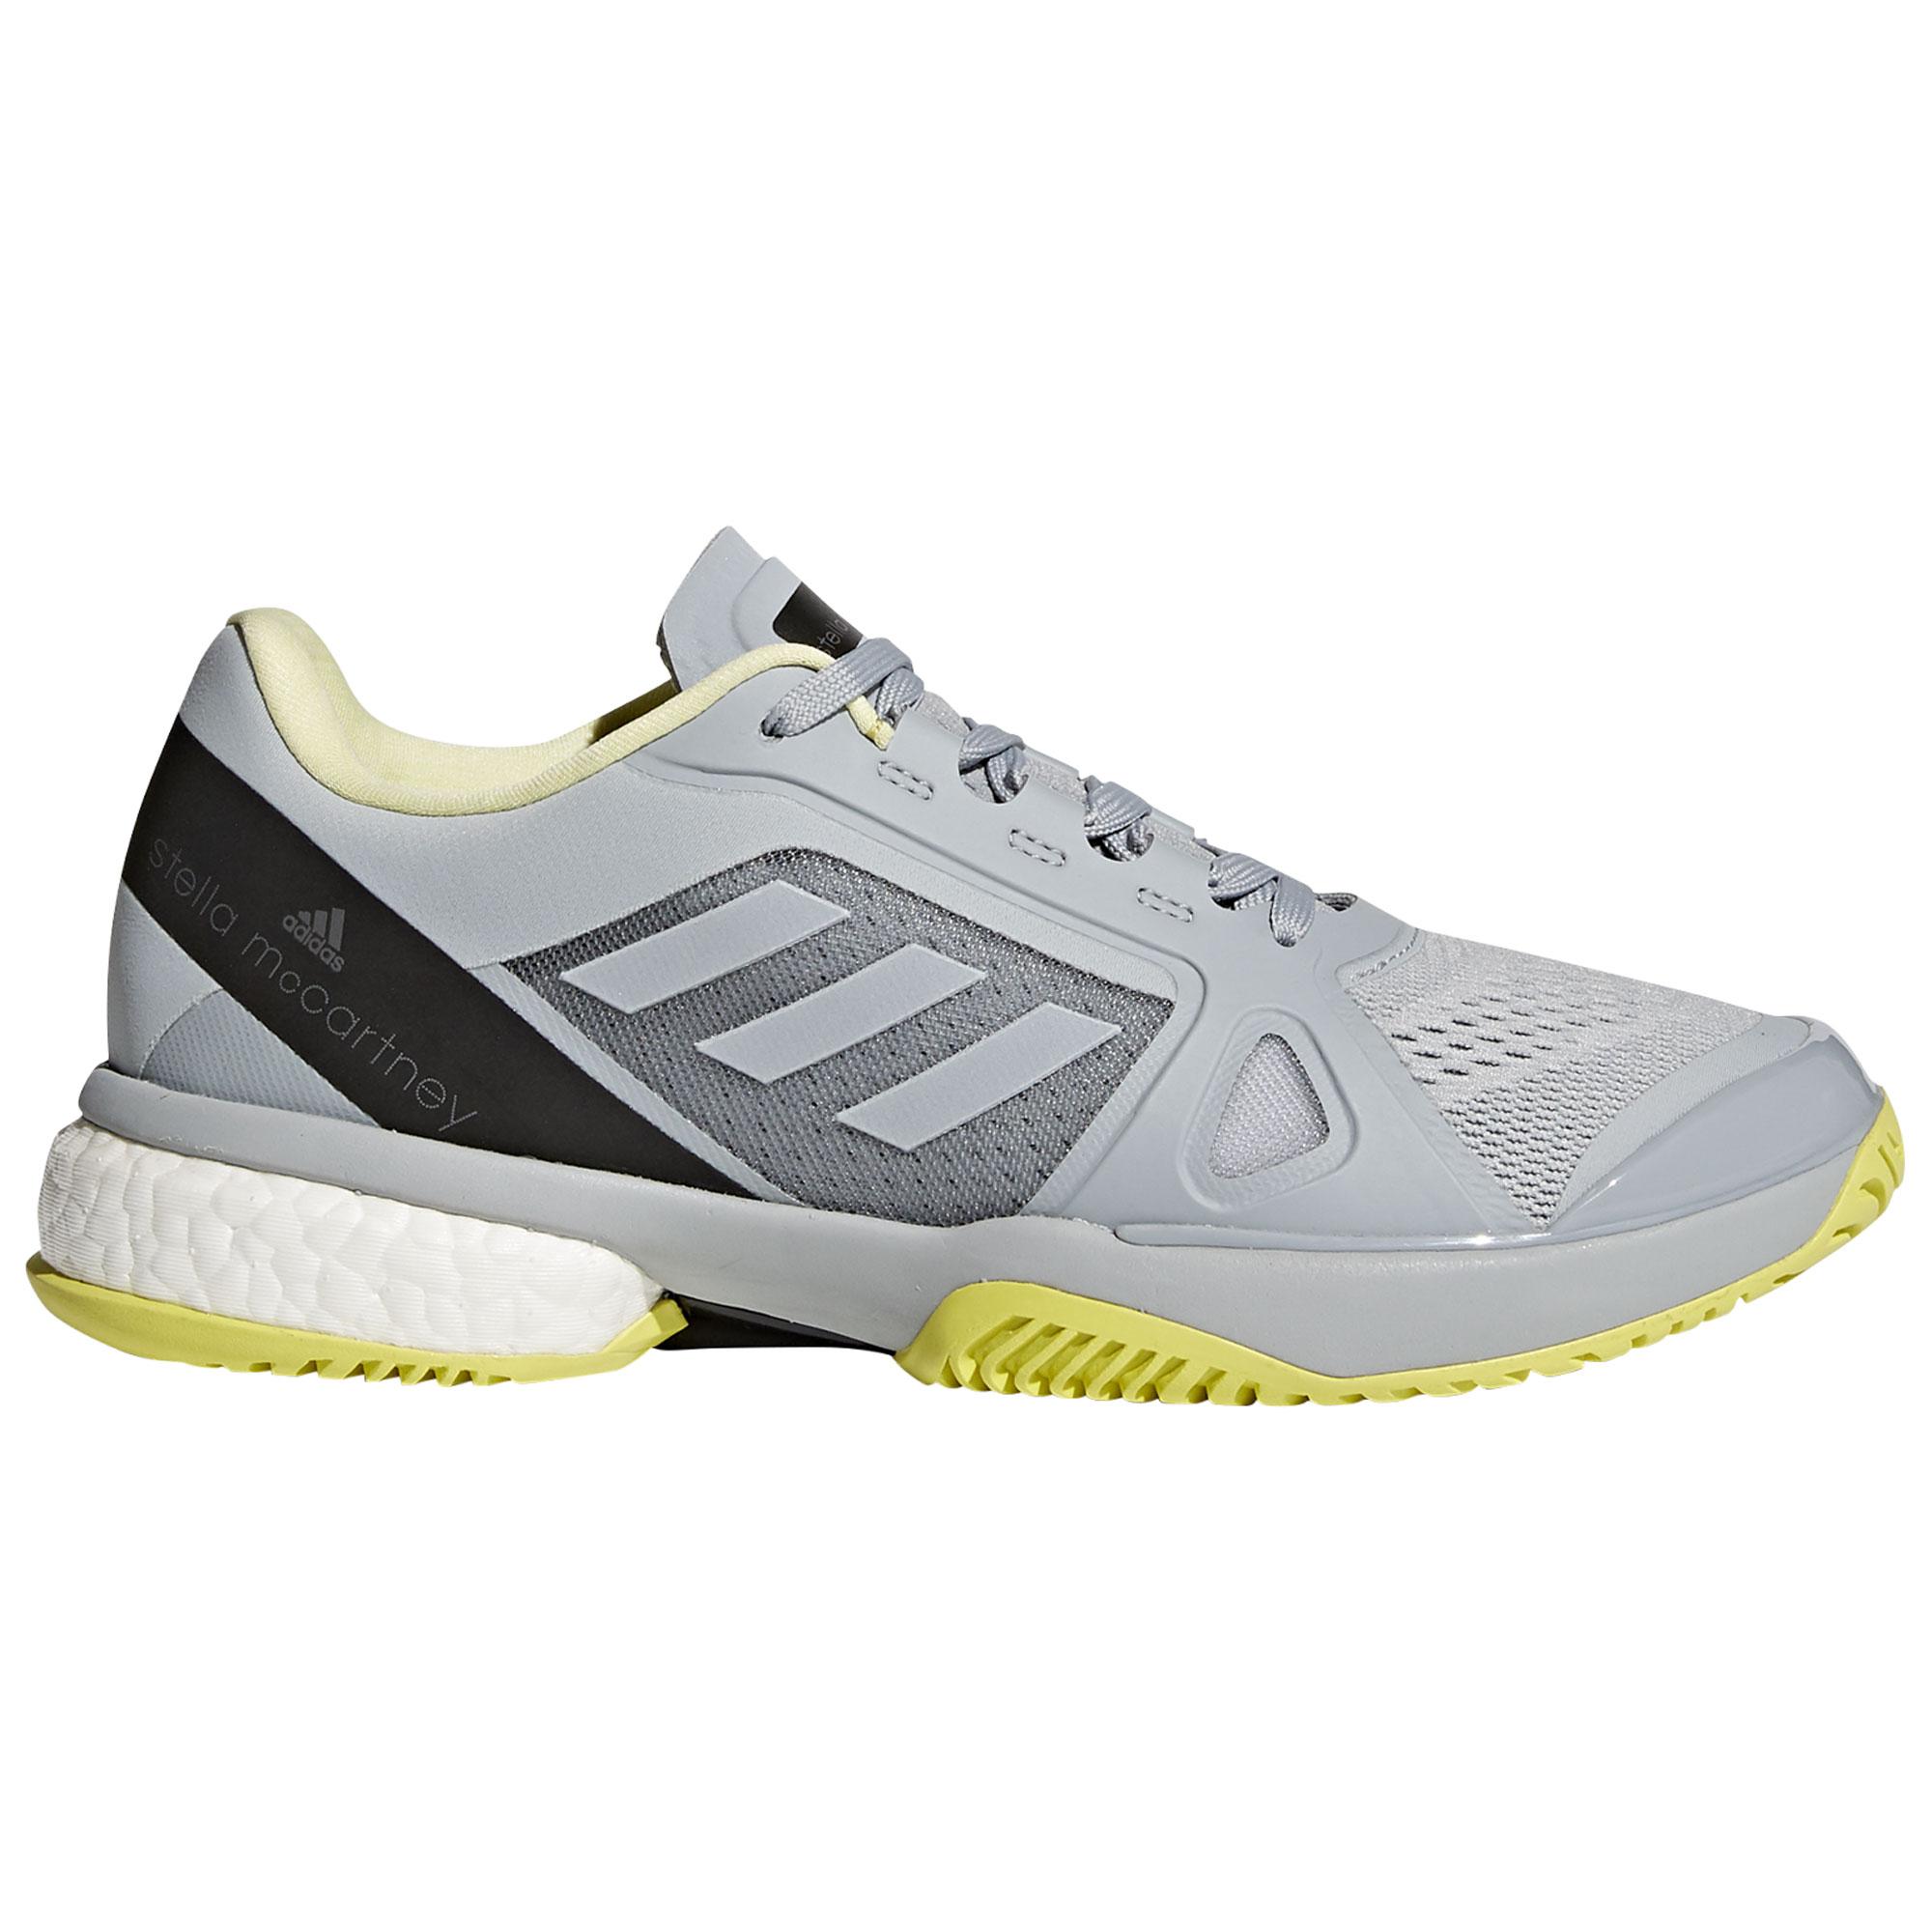 Afbeelding van Adidas Barricade Boost Stella McCartney CM7803 Tennisschoenen Dames Eggshell Grey Aero Lime